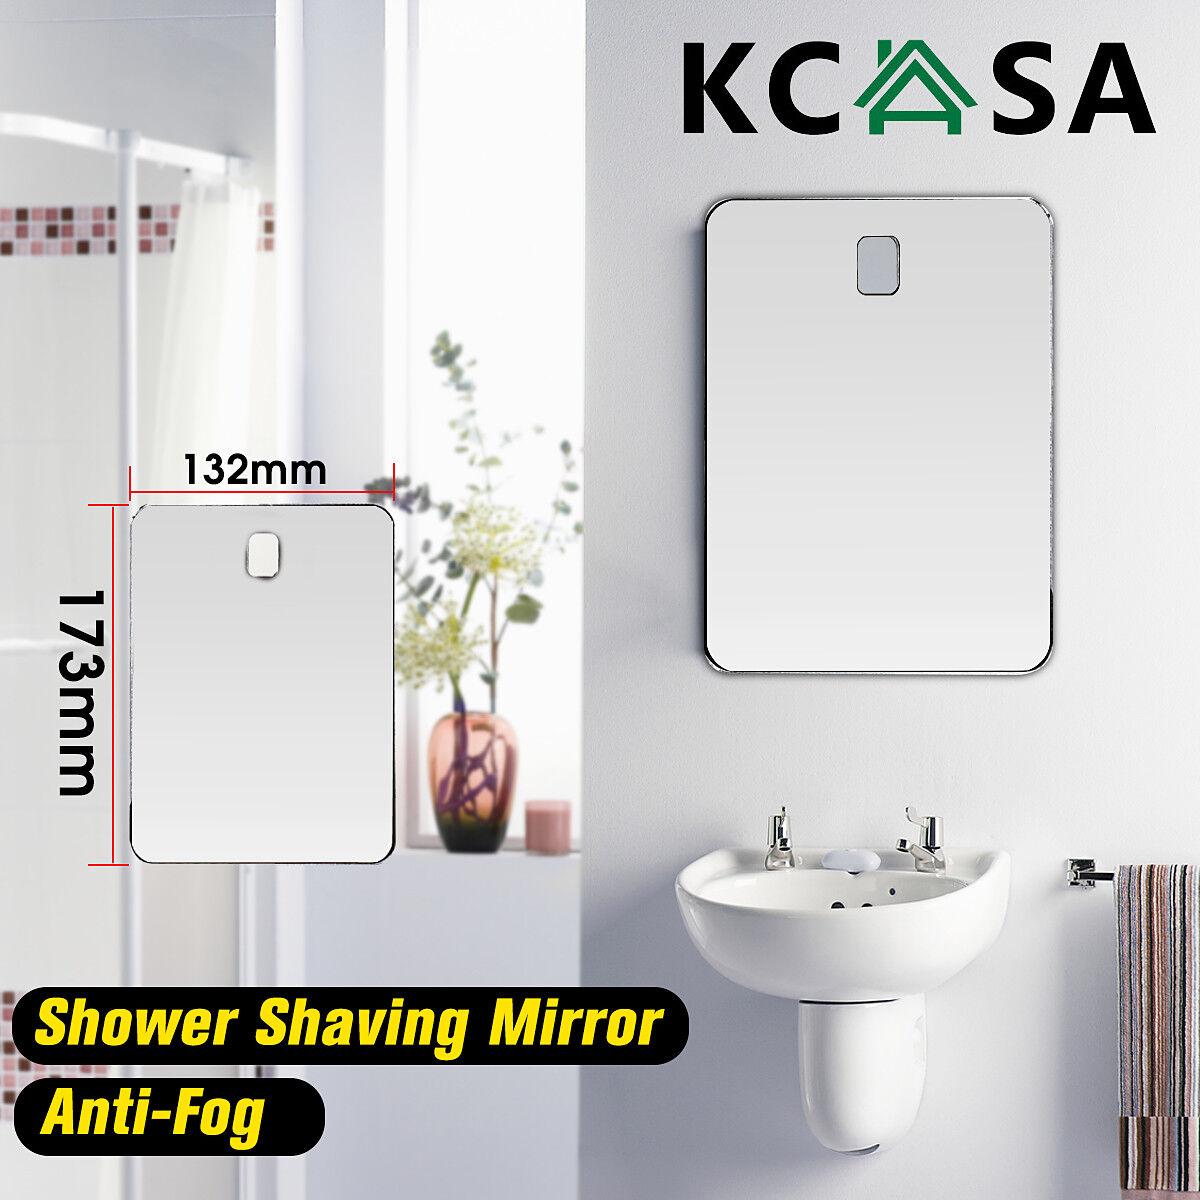 KCASA Fogless Shaving Shower Mirror Bathroom Anti-fog Wall Suction ...